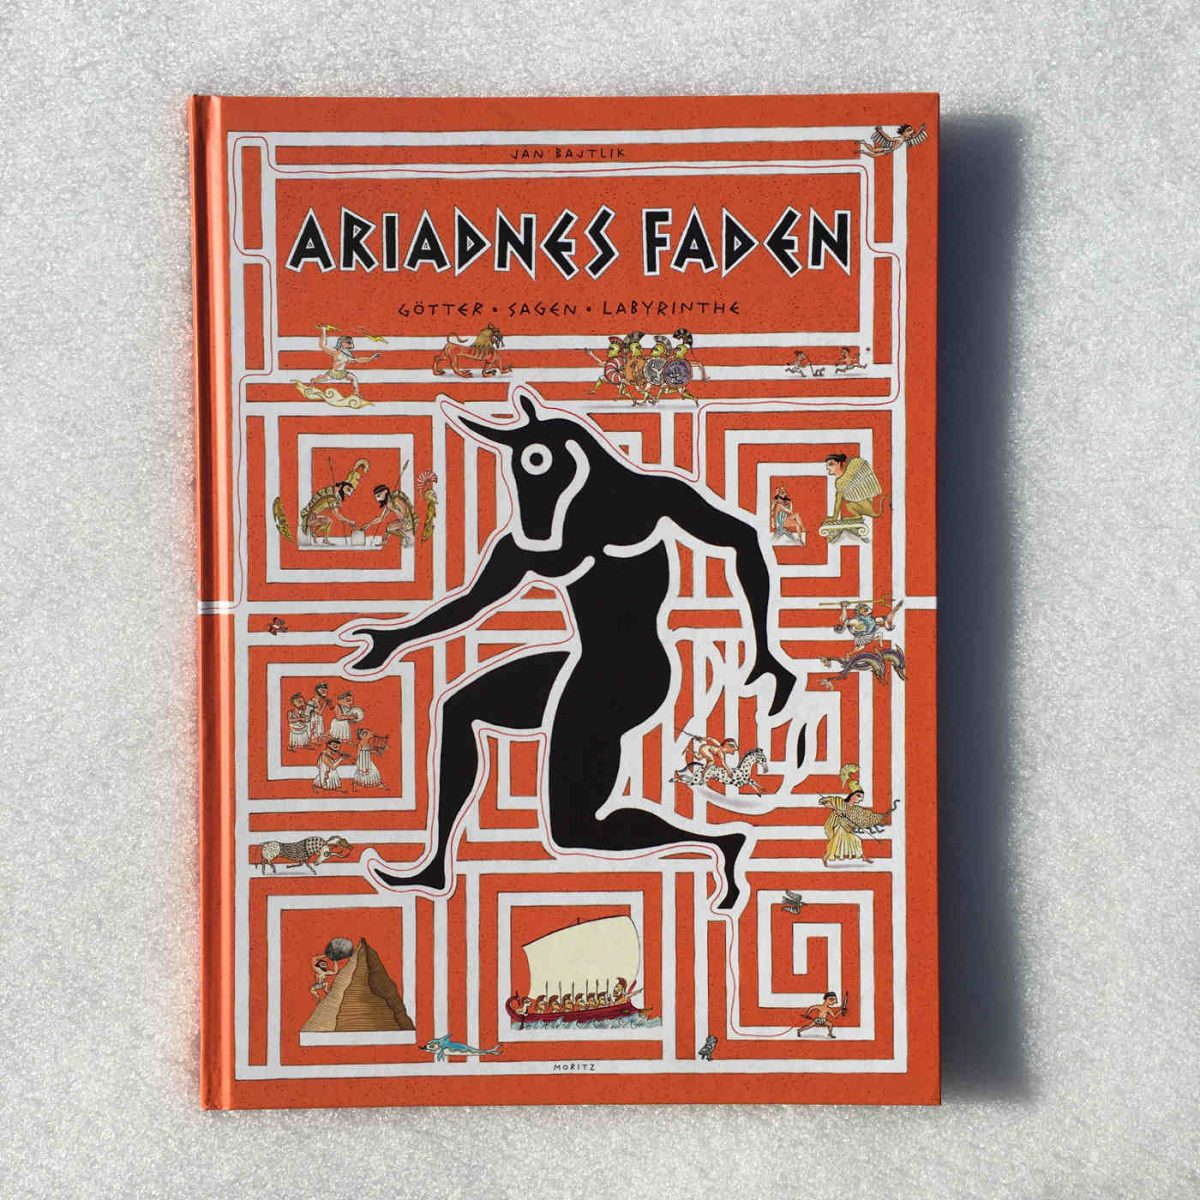 Jan Bajtlik. Ariadnes Faden: Götter, Sagen, Labyrinthe